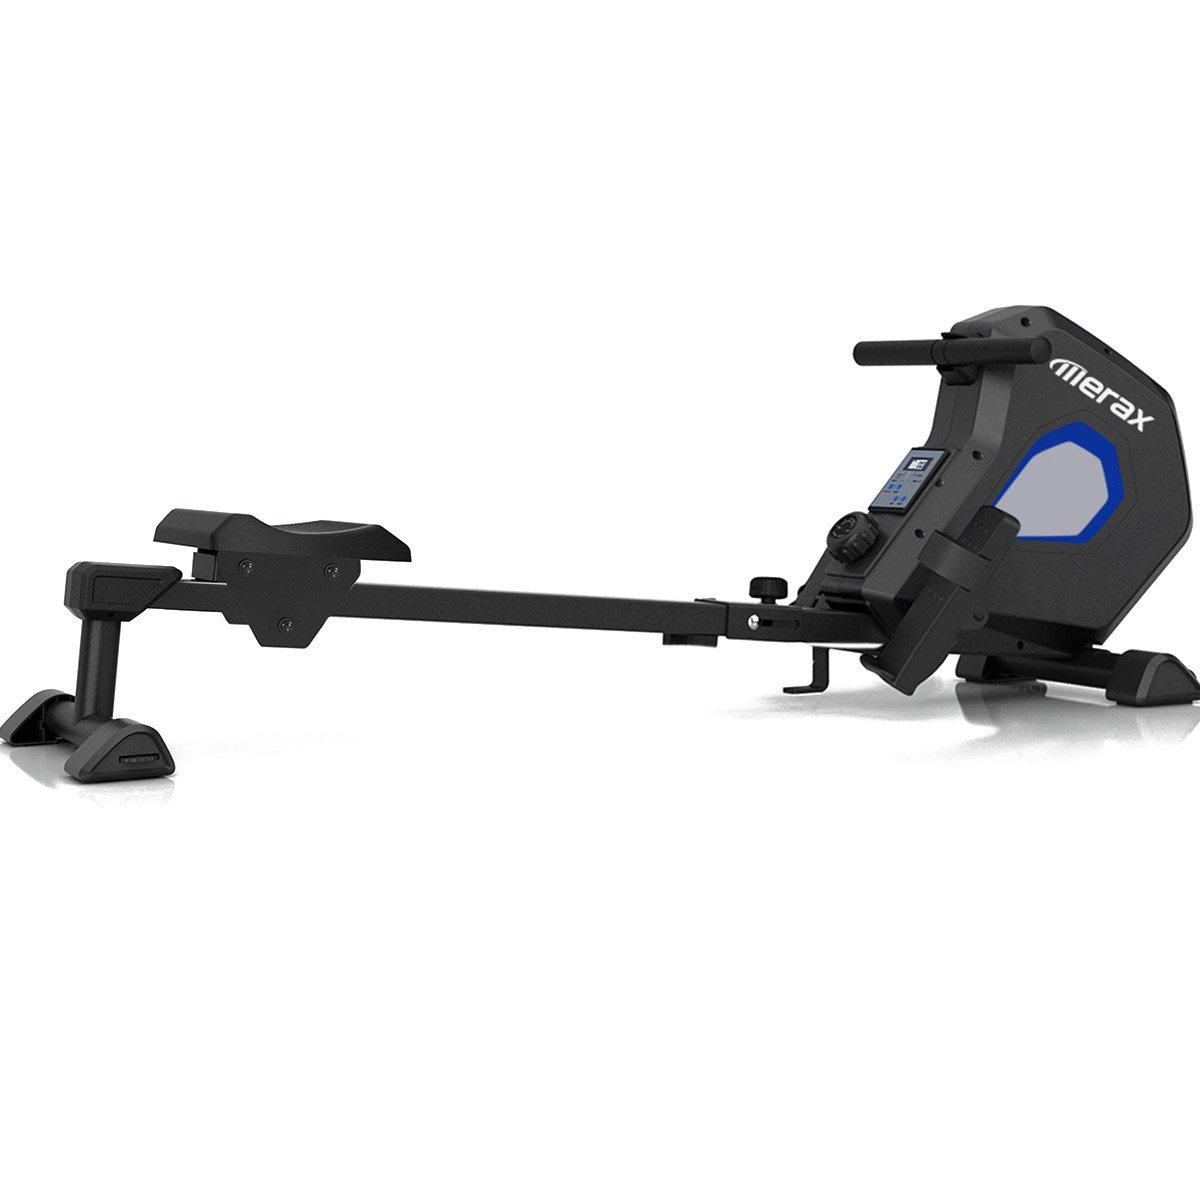 Merax Magnetic Exercise Rower Adjustable Resistance Rowing Machine (BK) by Merax (Image #1)